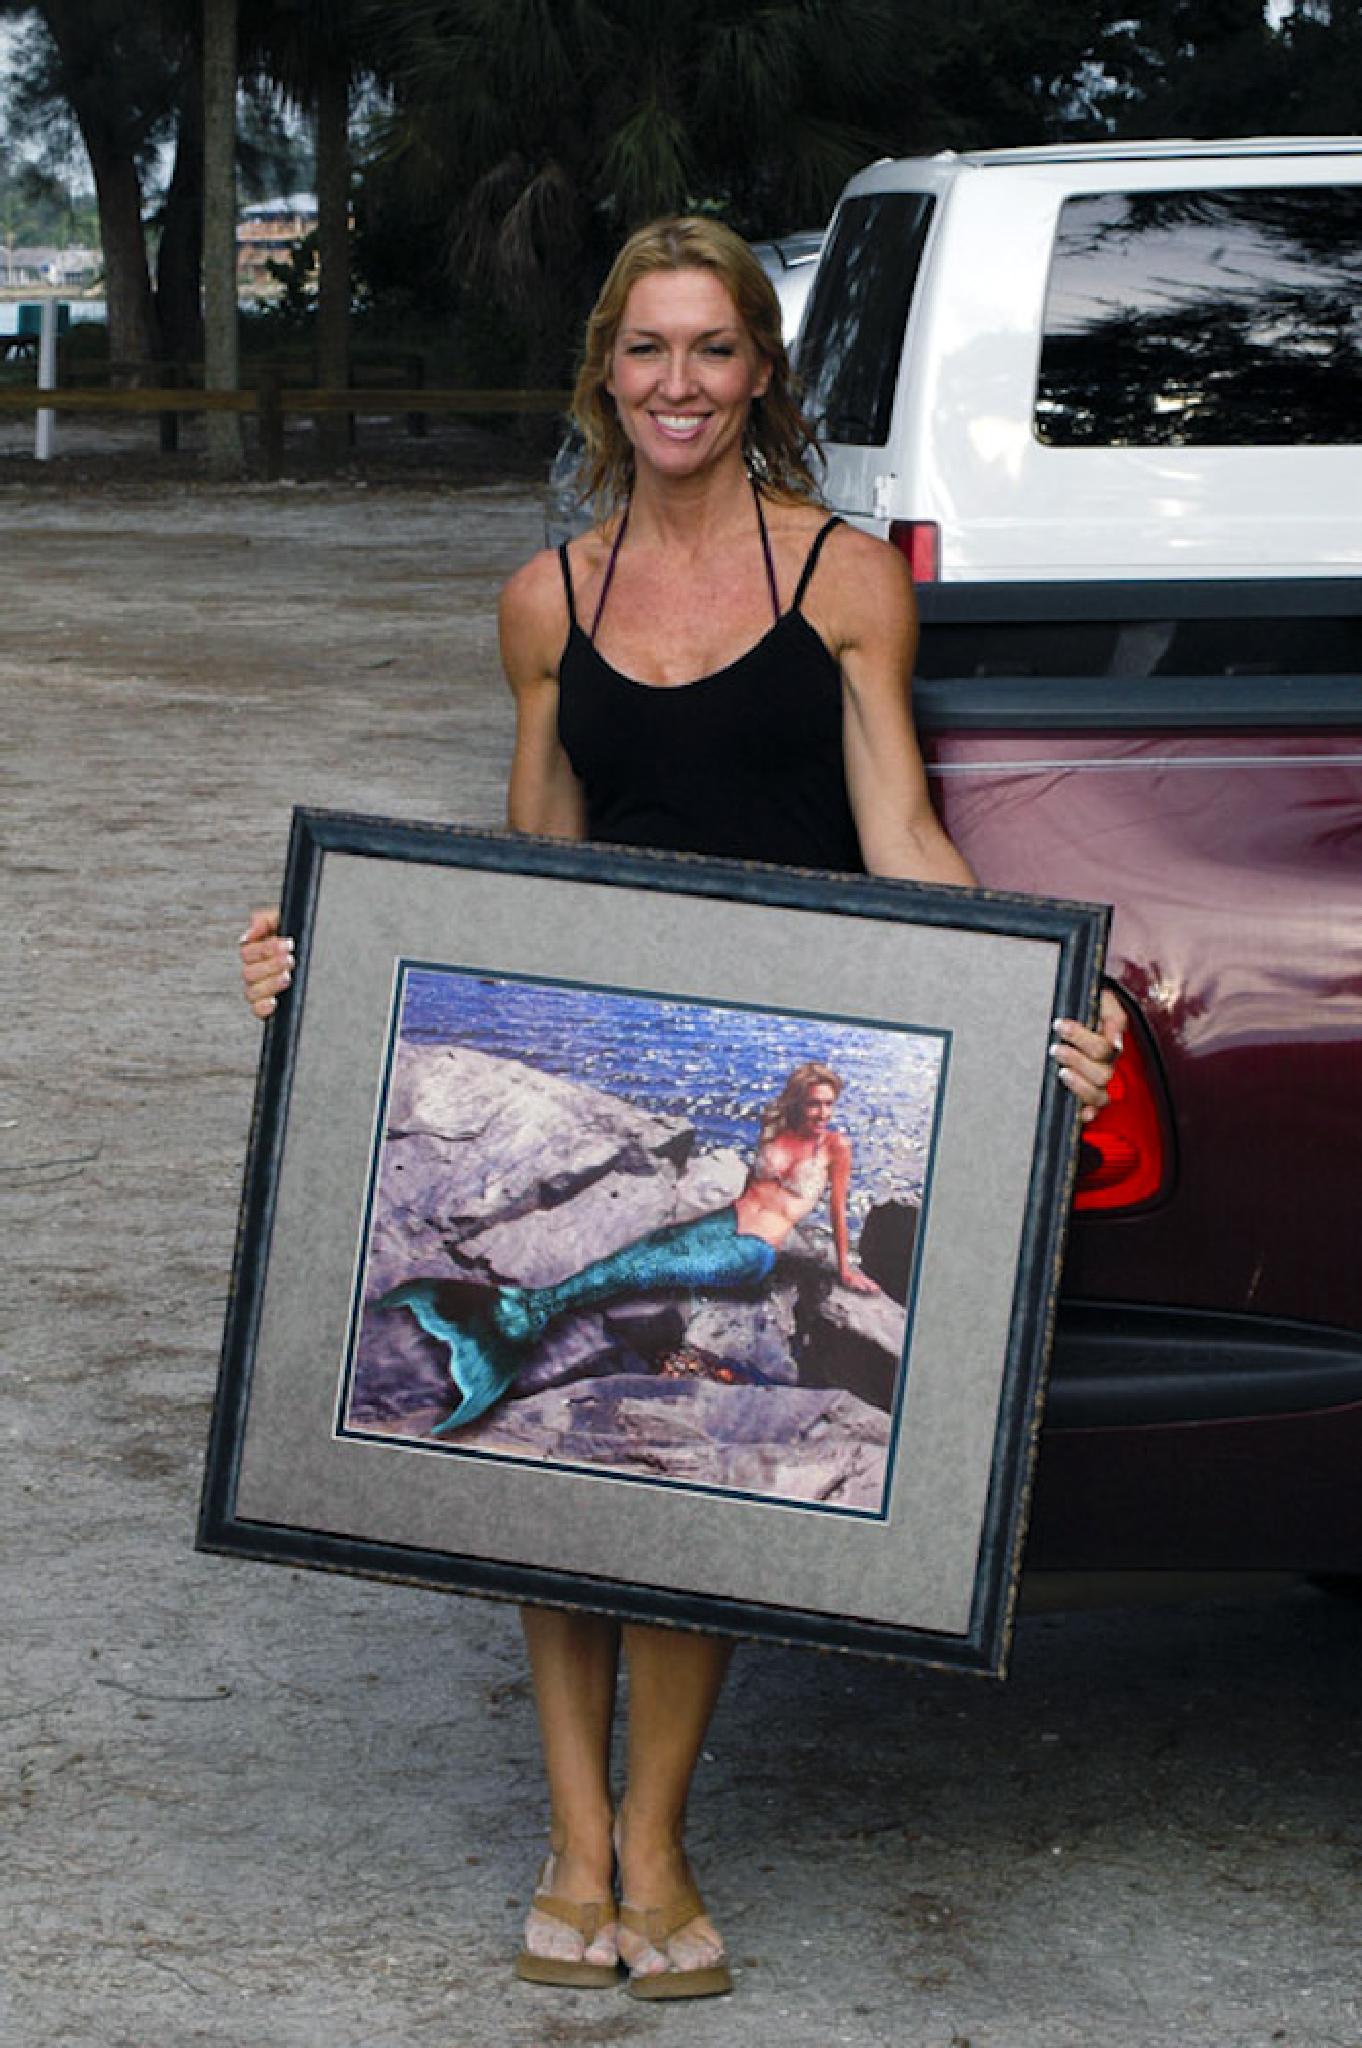 Gail Mermaid Transformation by wes.johnson.58